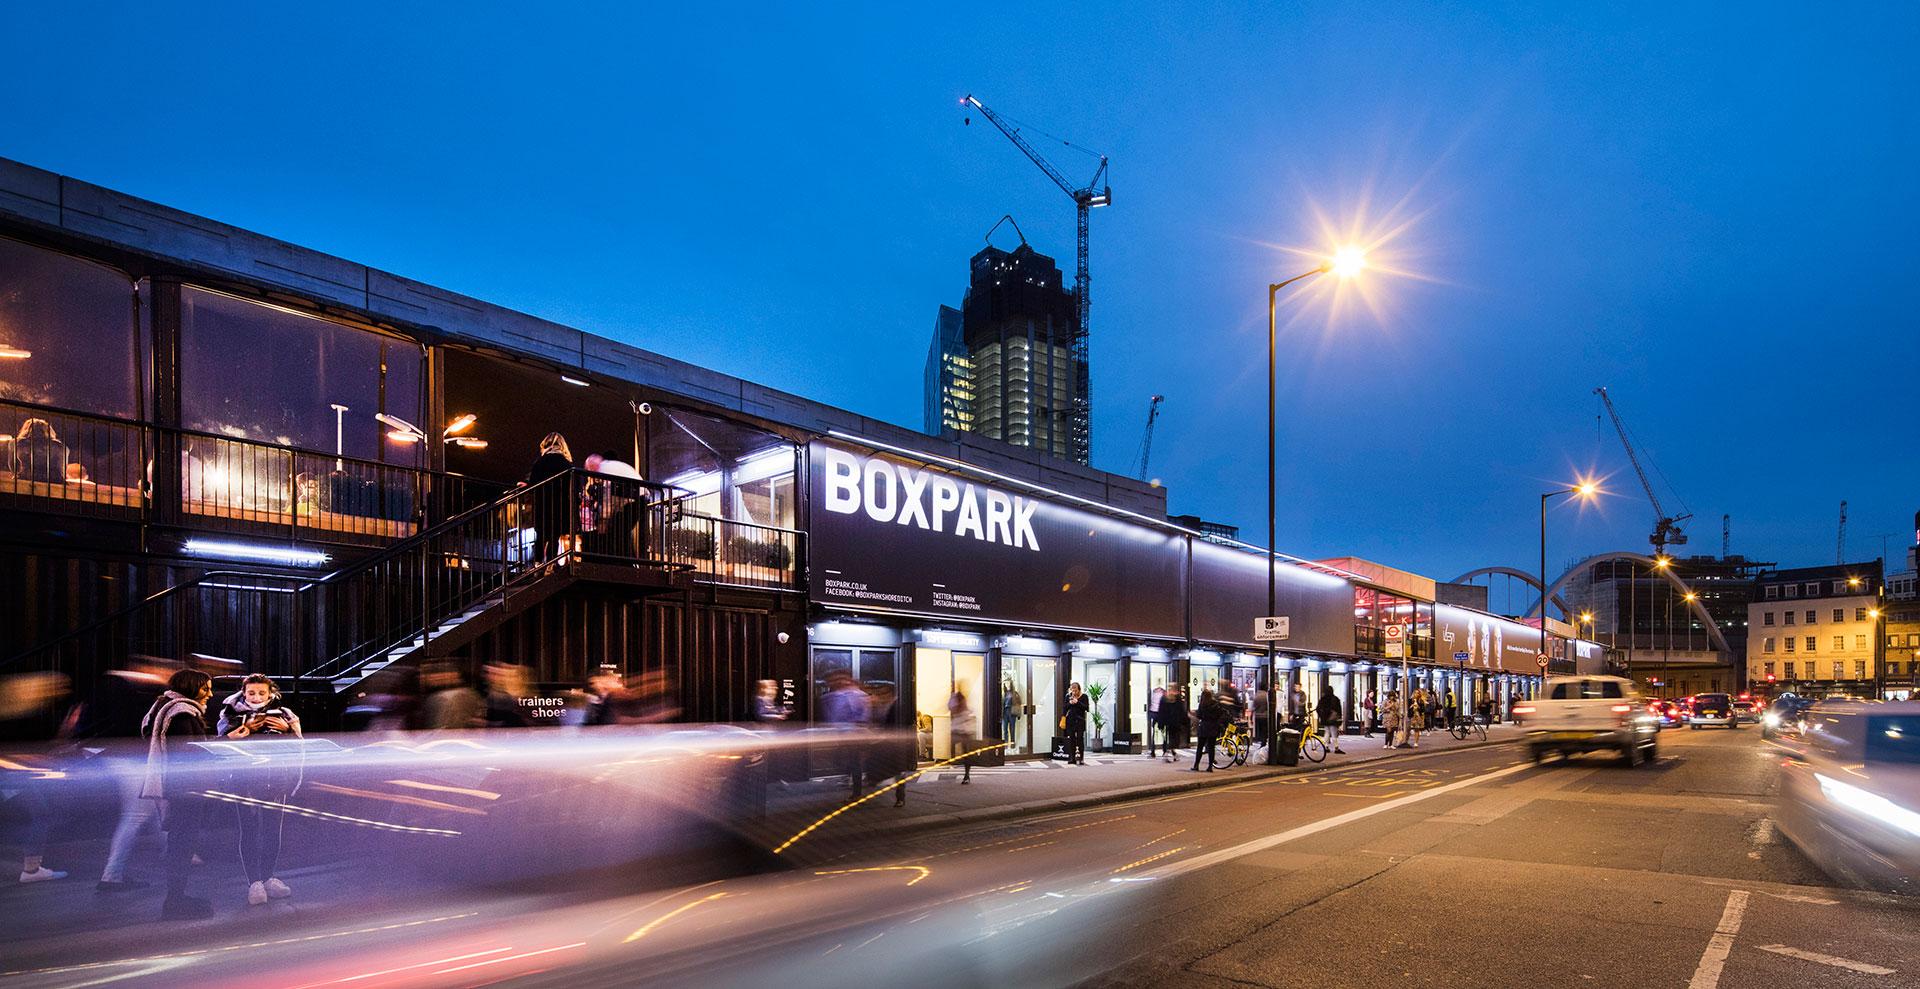 BOXPARK SHOREDITCH, LONDON VIA FACEBOOK